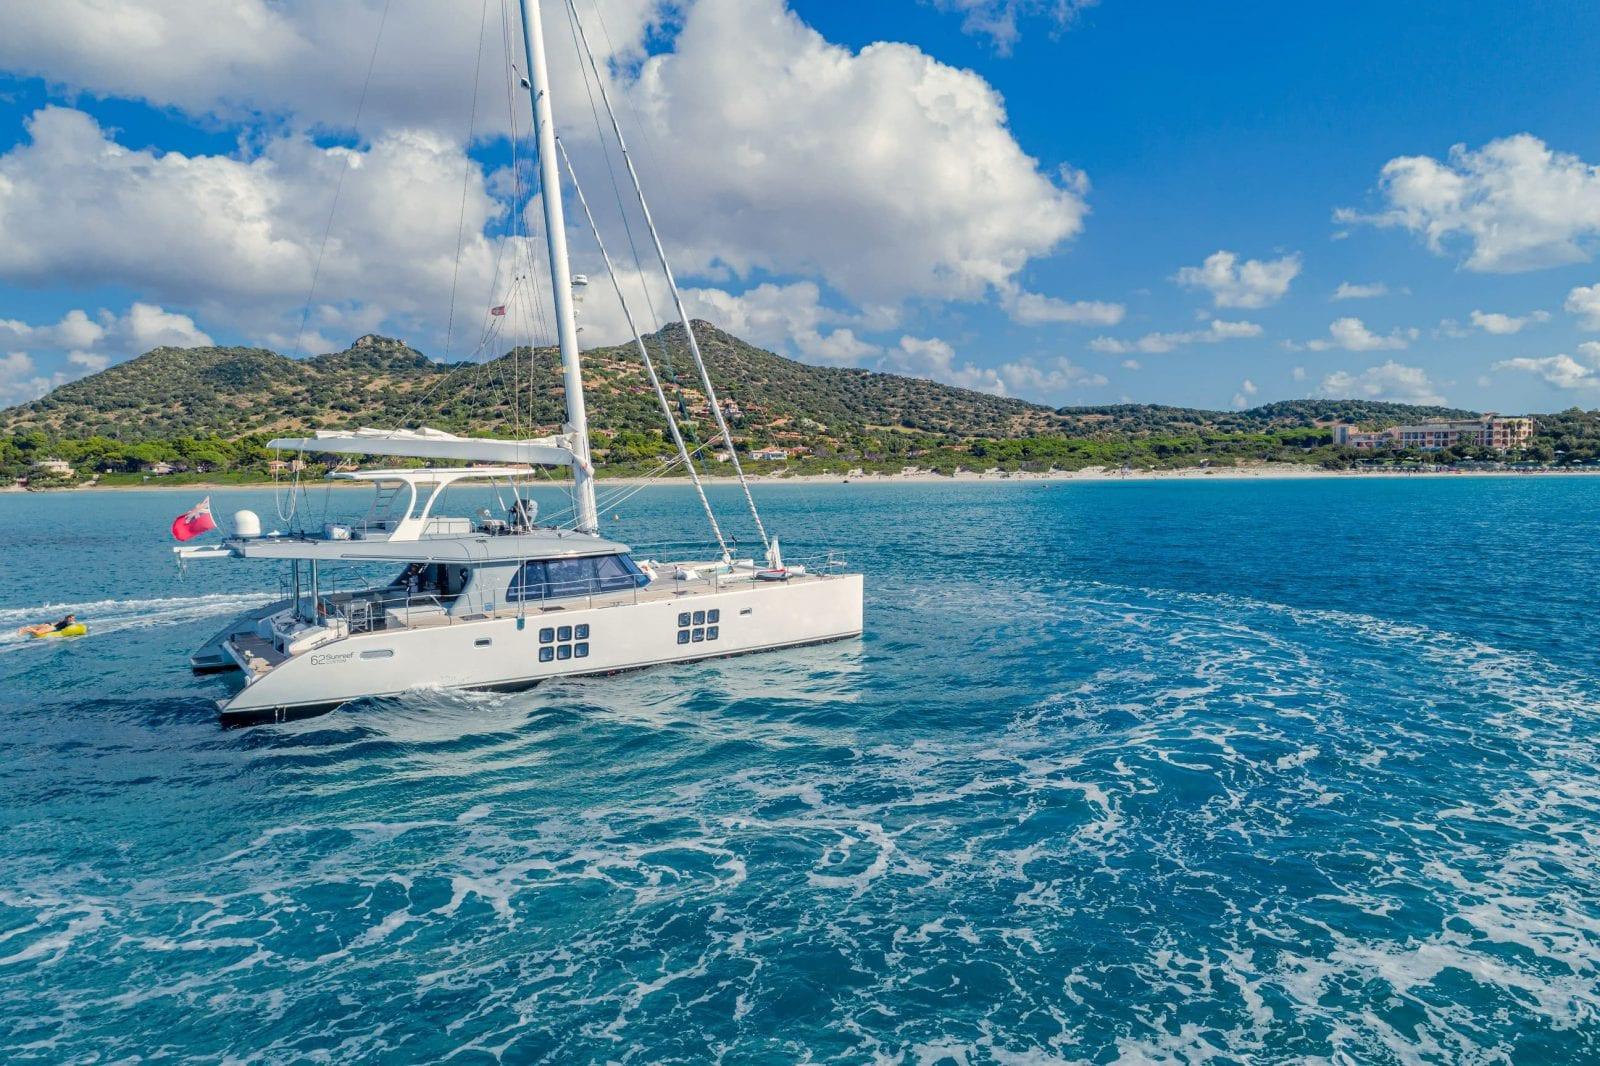 ADEA - Sunreef 62 on charter